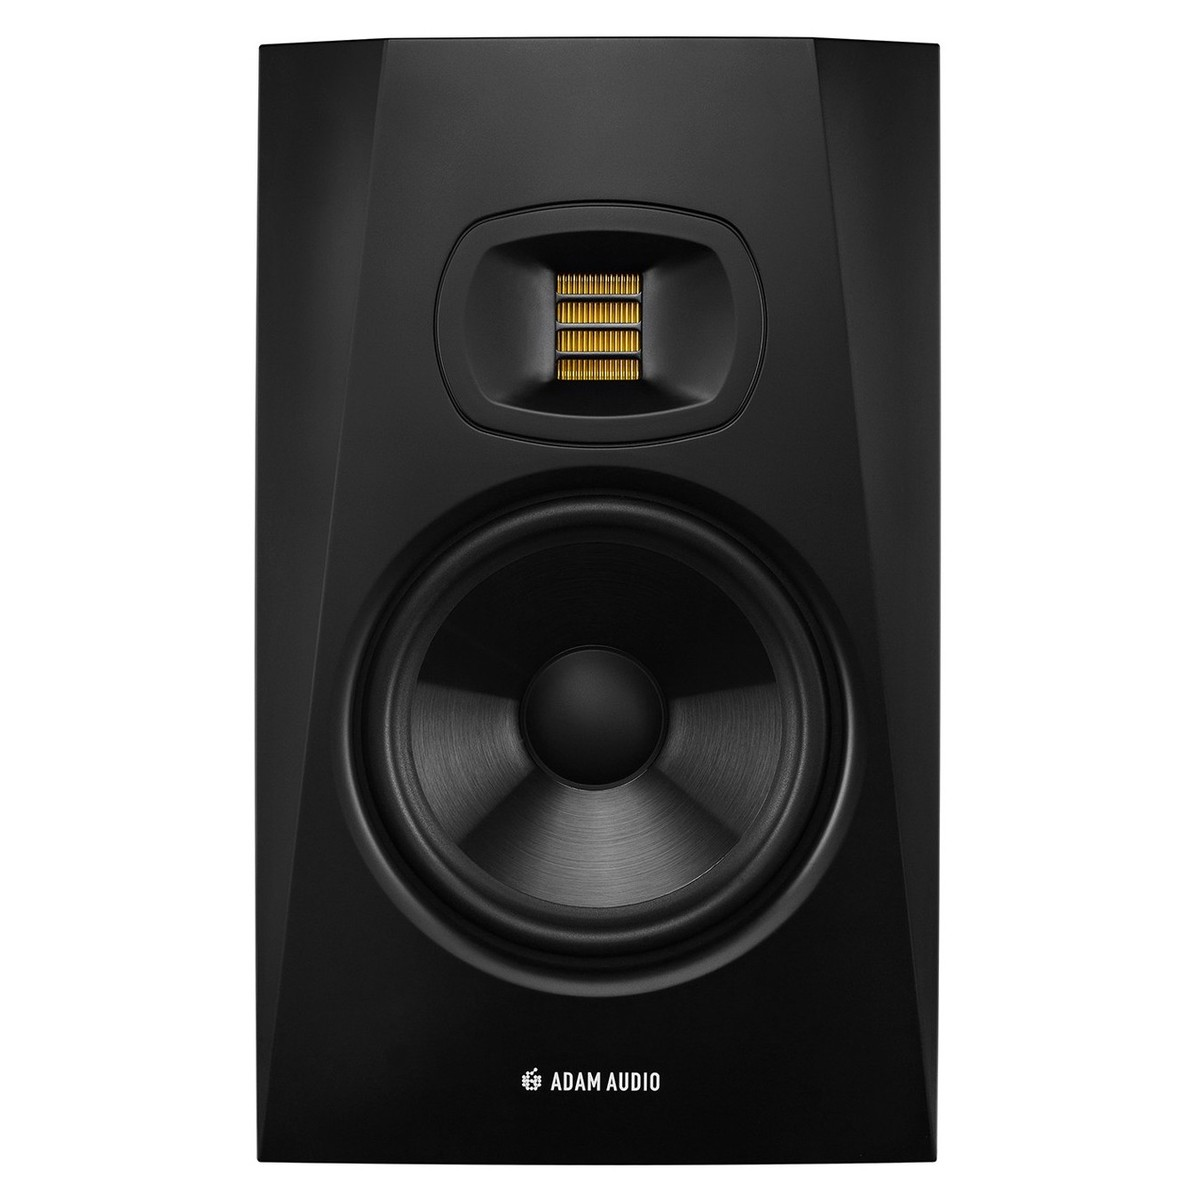 adam audio t7v studio monitors pair at gear4music. Black Bedroom Furniture Sets. Home Design Ideas